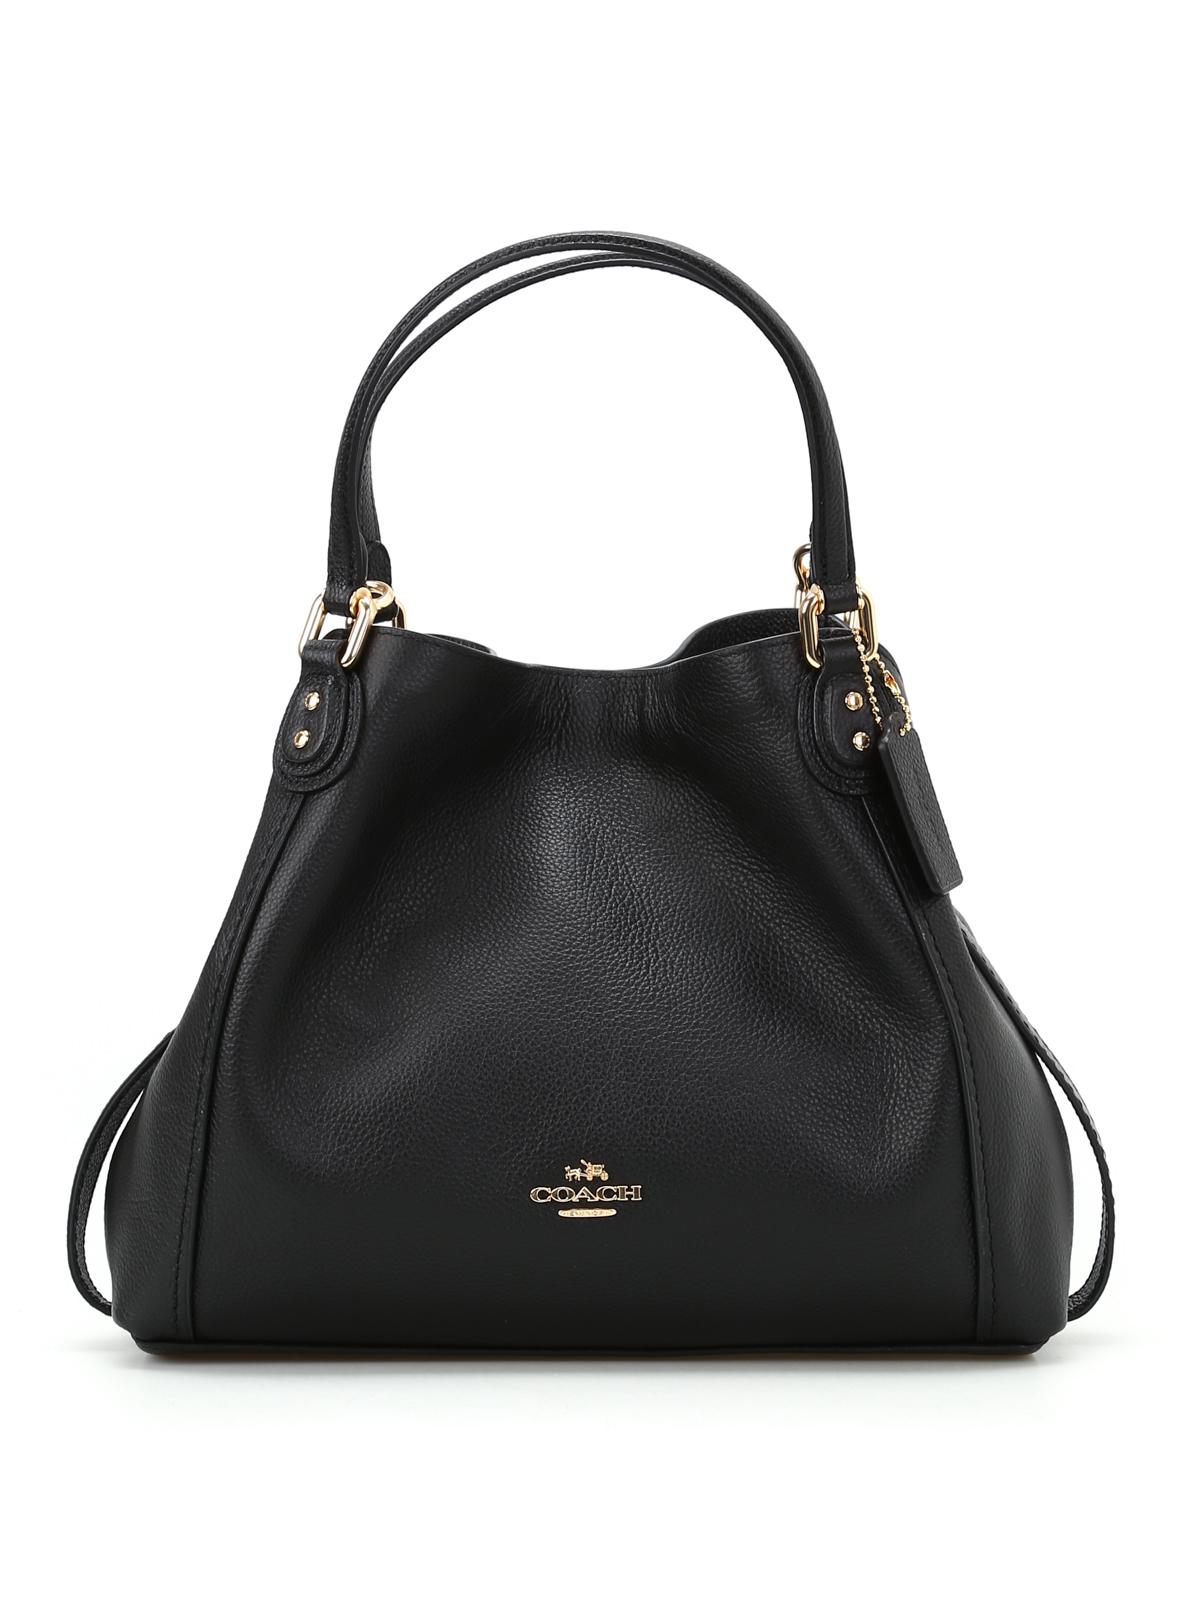 Coach - Edie 28 black grainy leather tote - shoulder bags - 57124LIBLK